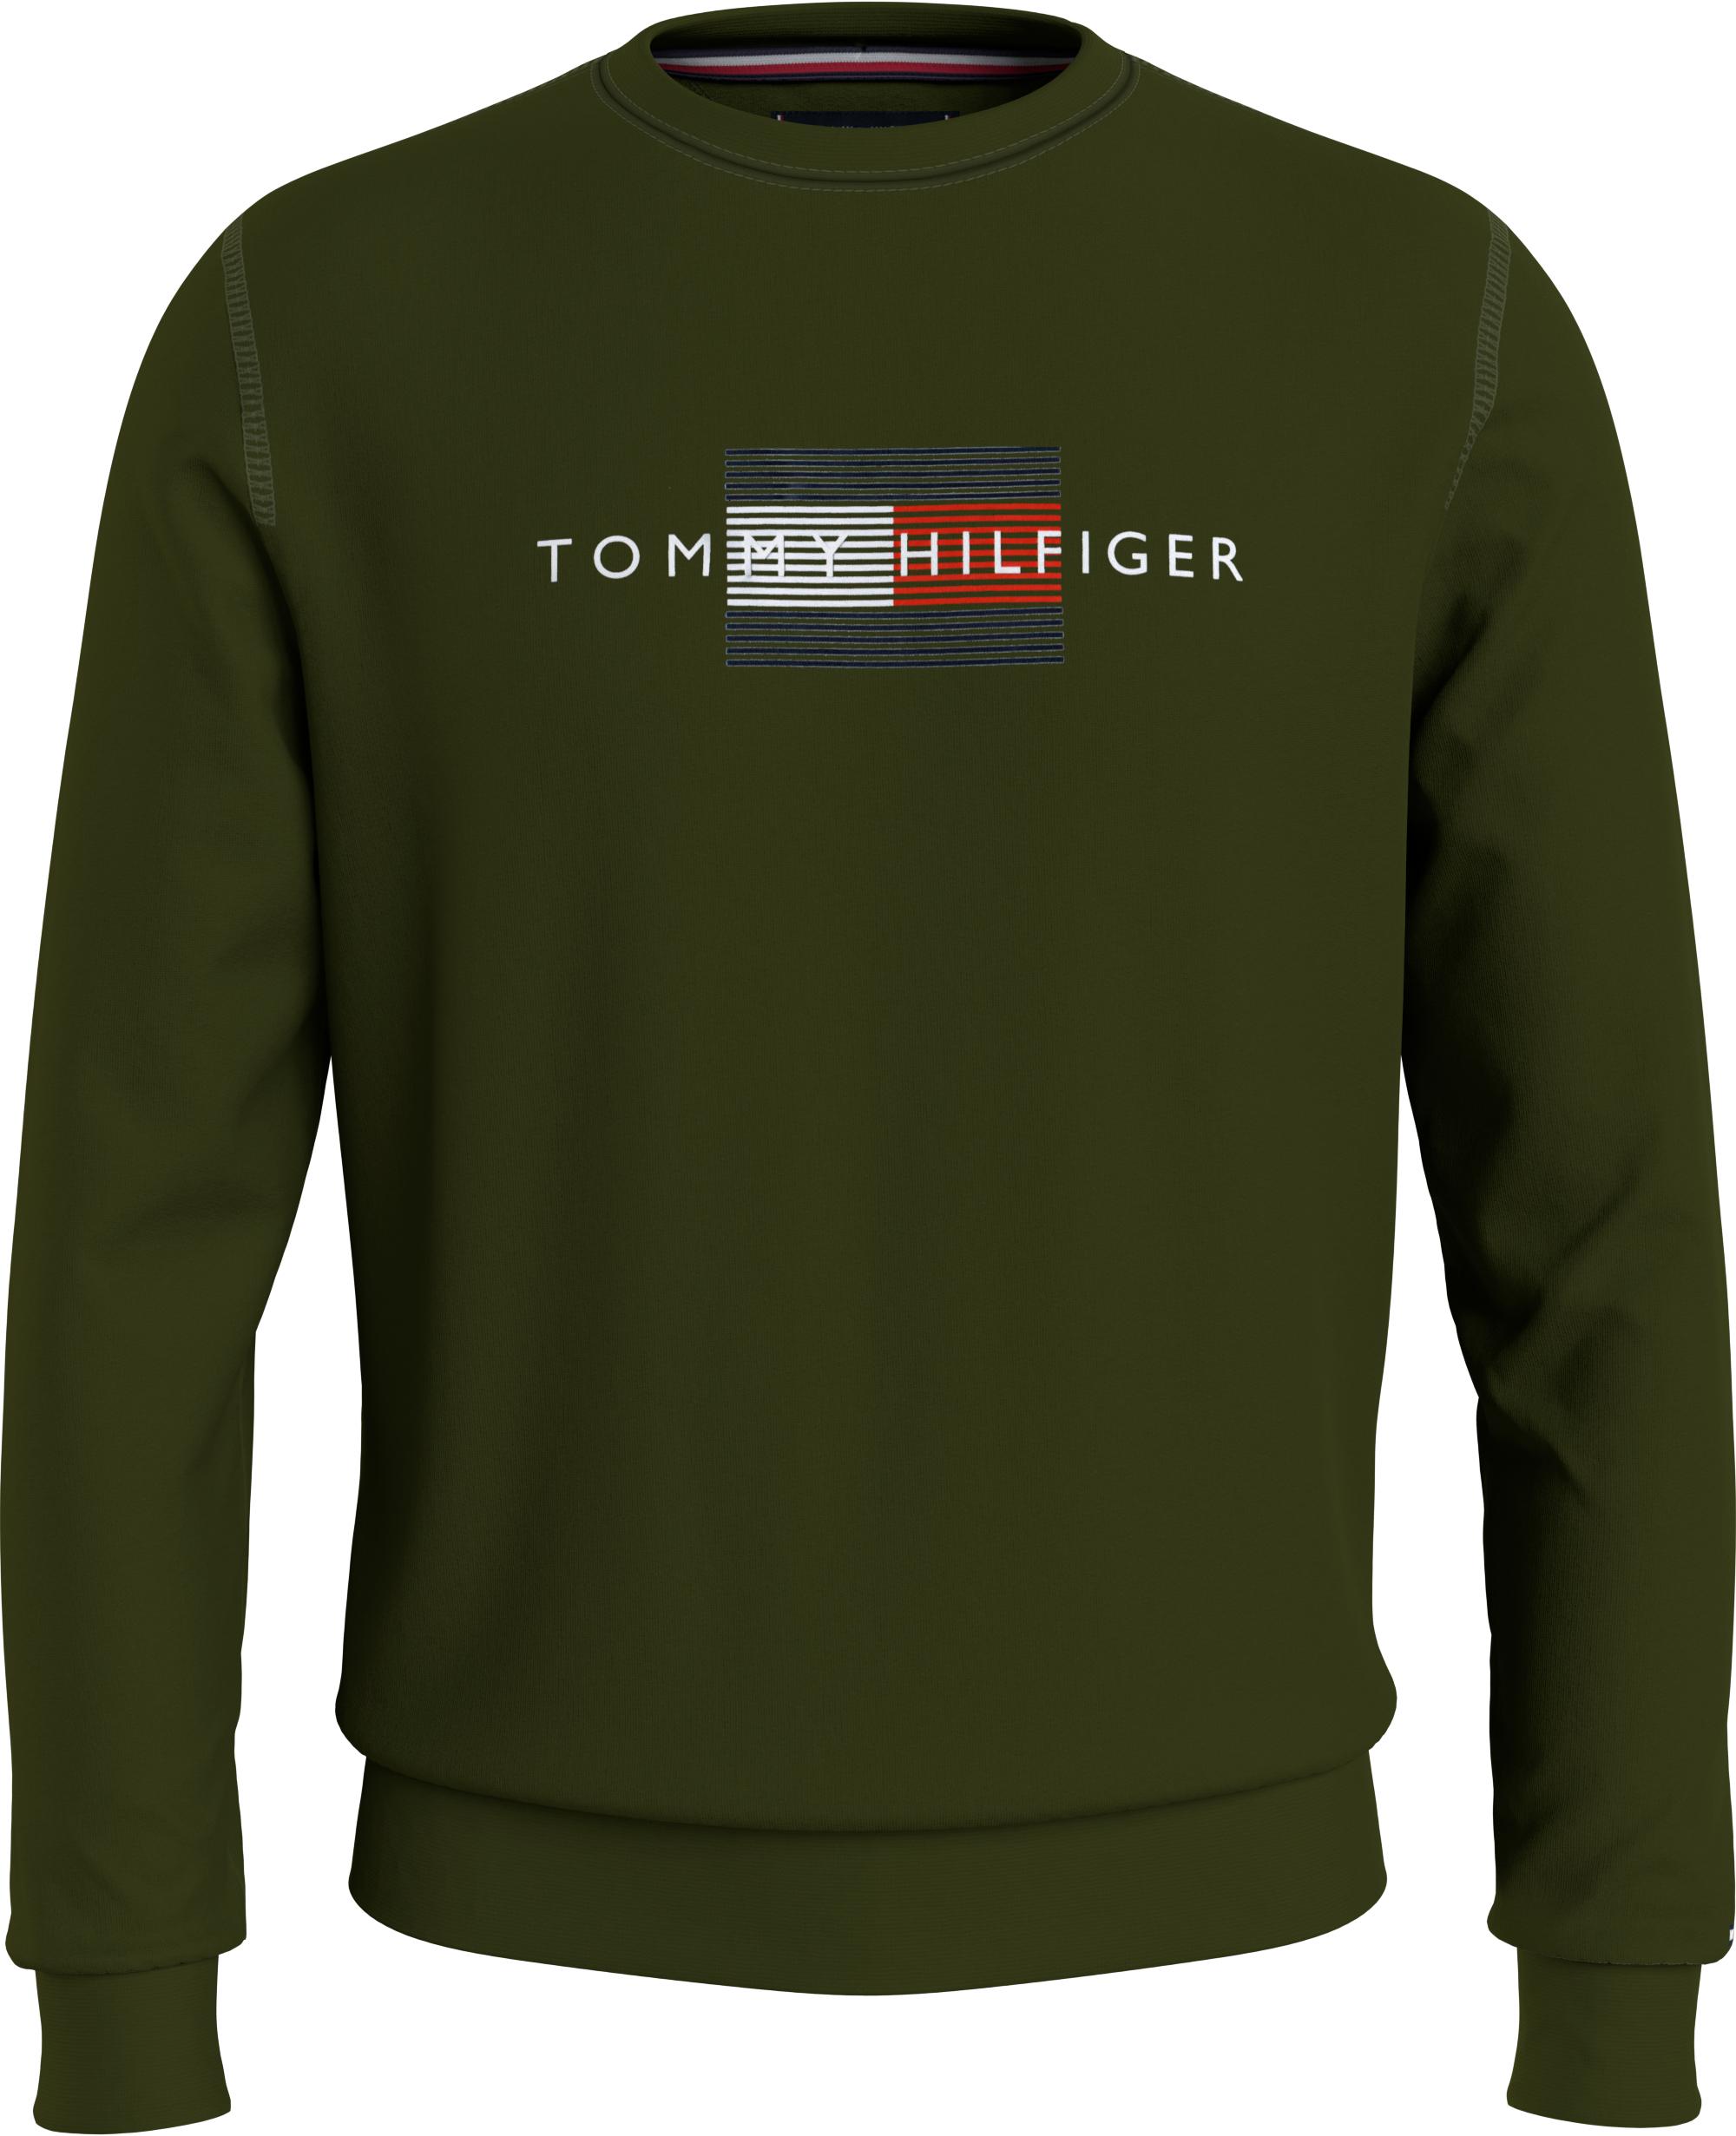 Sweatshirts LINES HILFIGER CREWNECK MW0MW20118